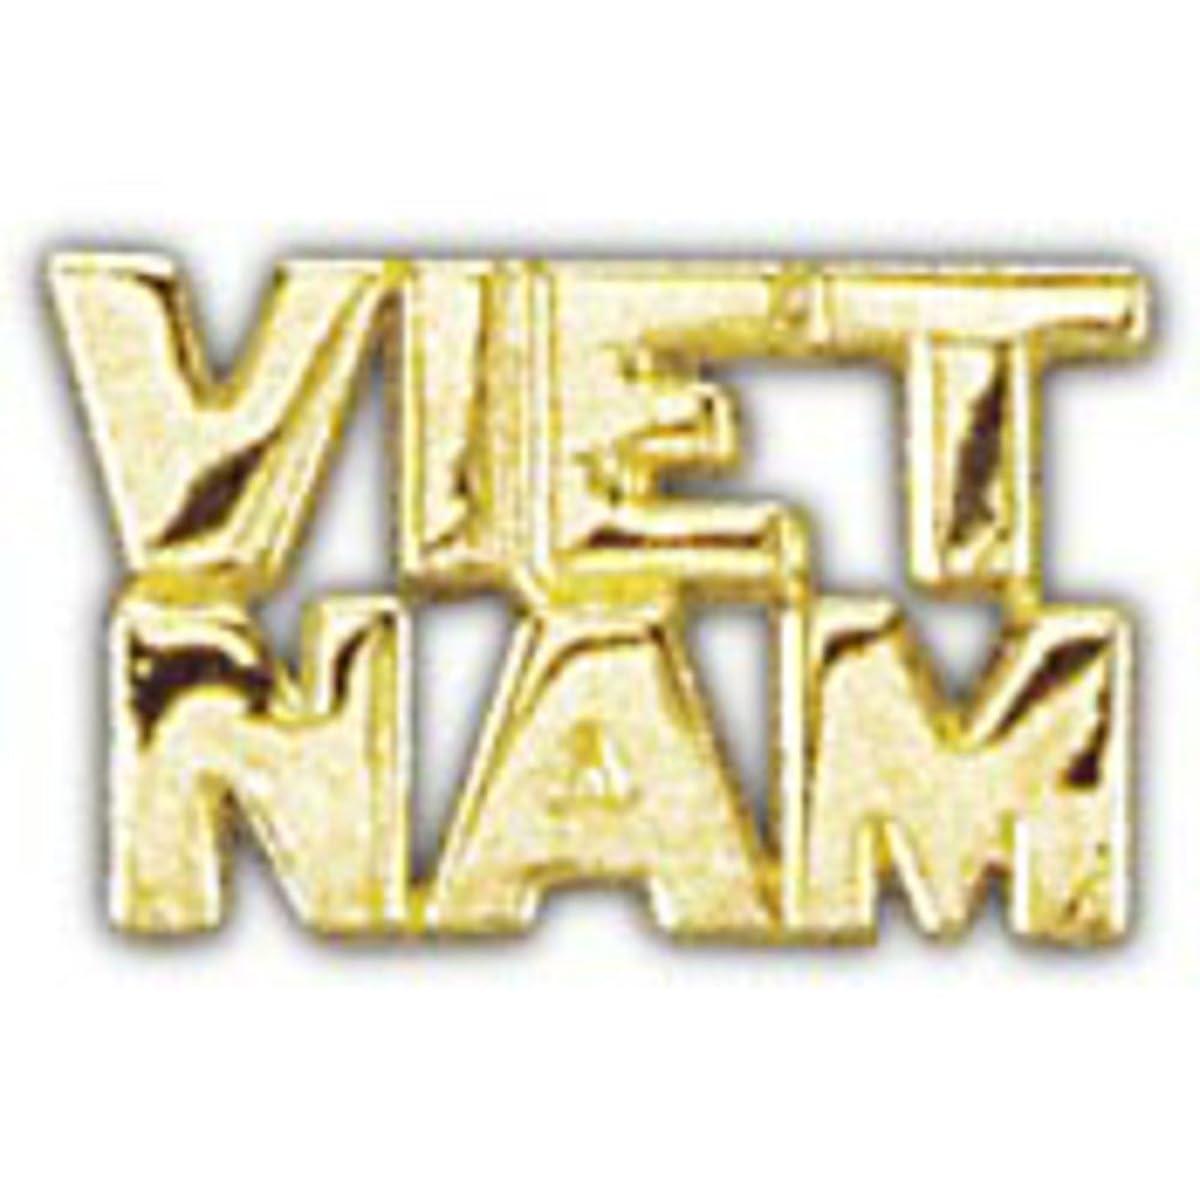 EagleEmblems P14997 Pin-Viet,SCR,Viet.NAM (1'')